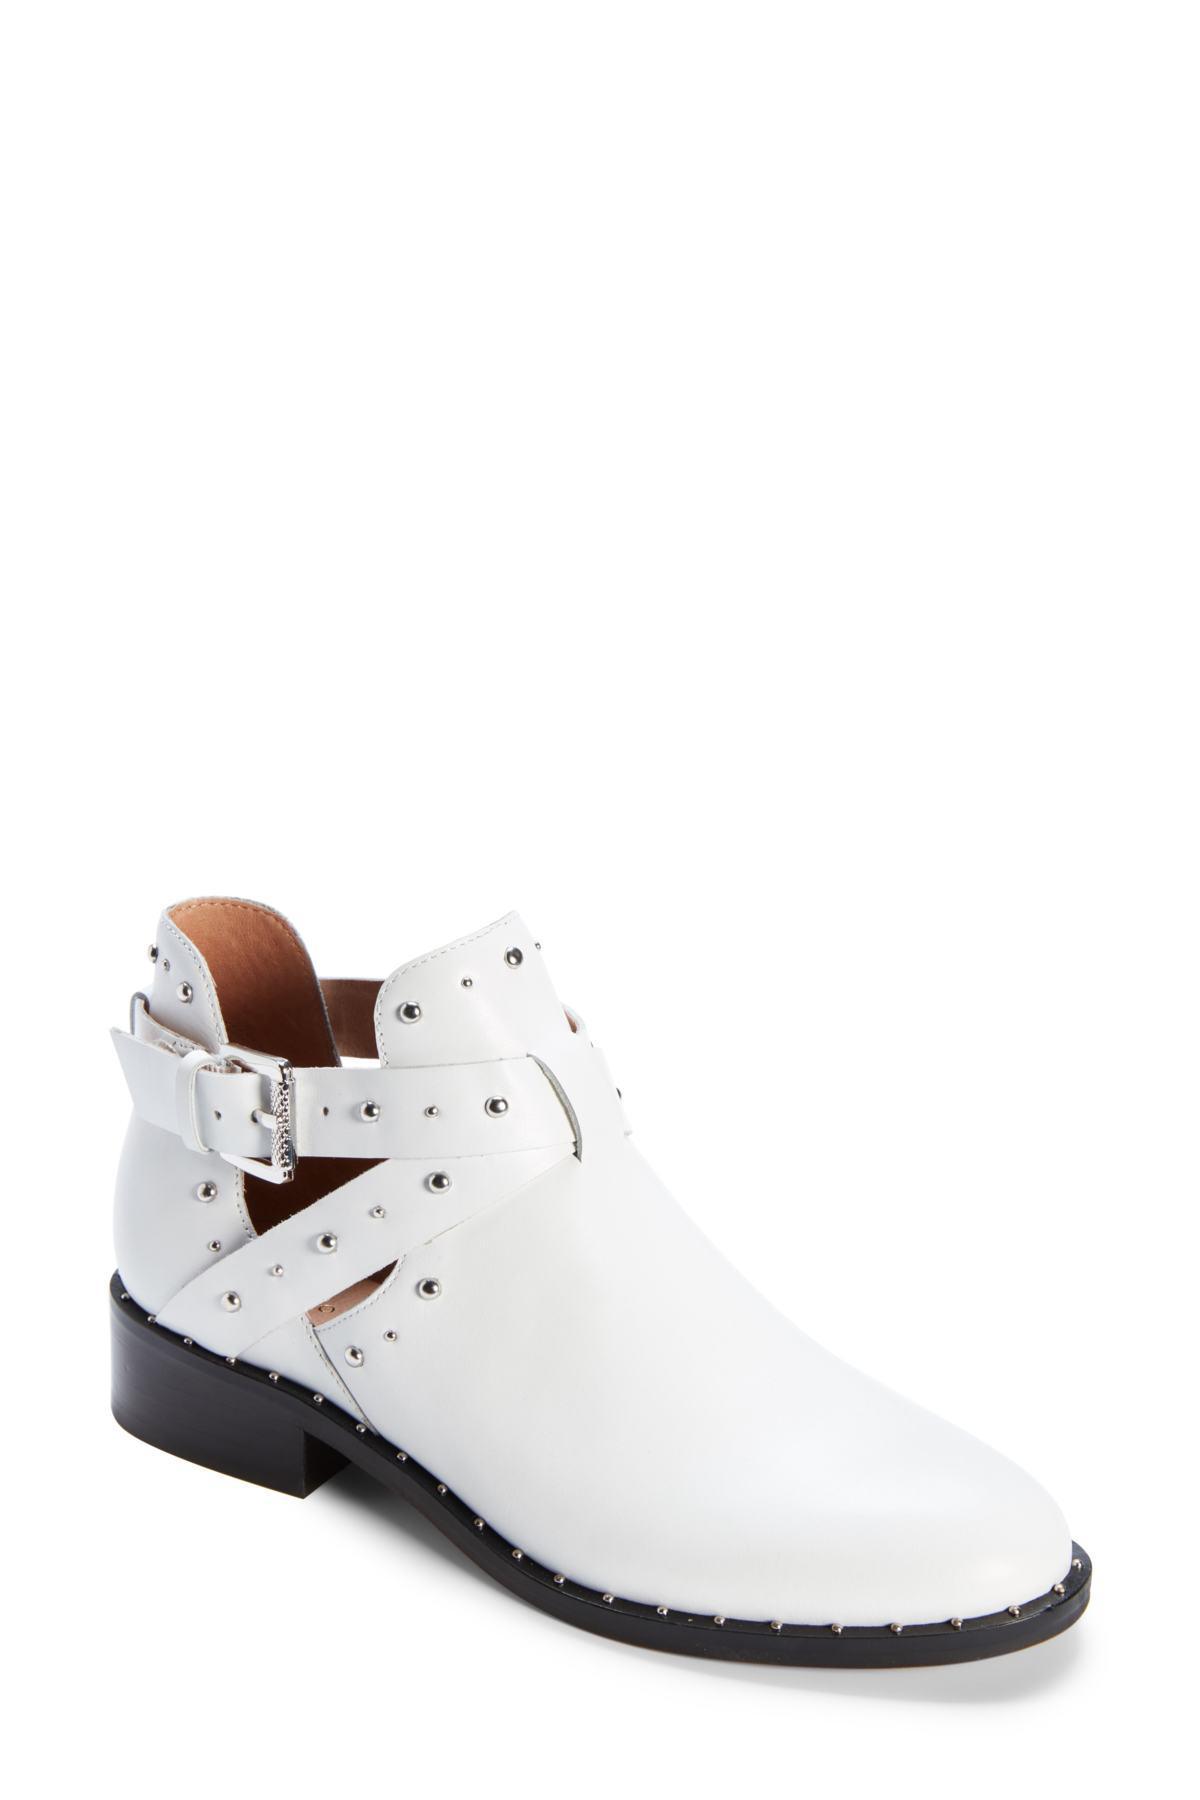 6d5fcc0cec5a Halogen (r) Hailey Bootie (women) in White - Lyst